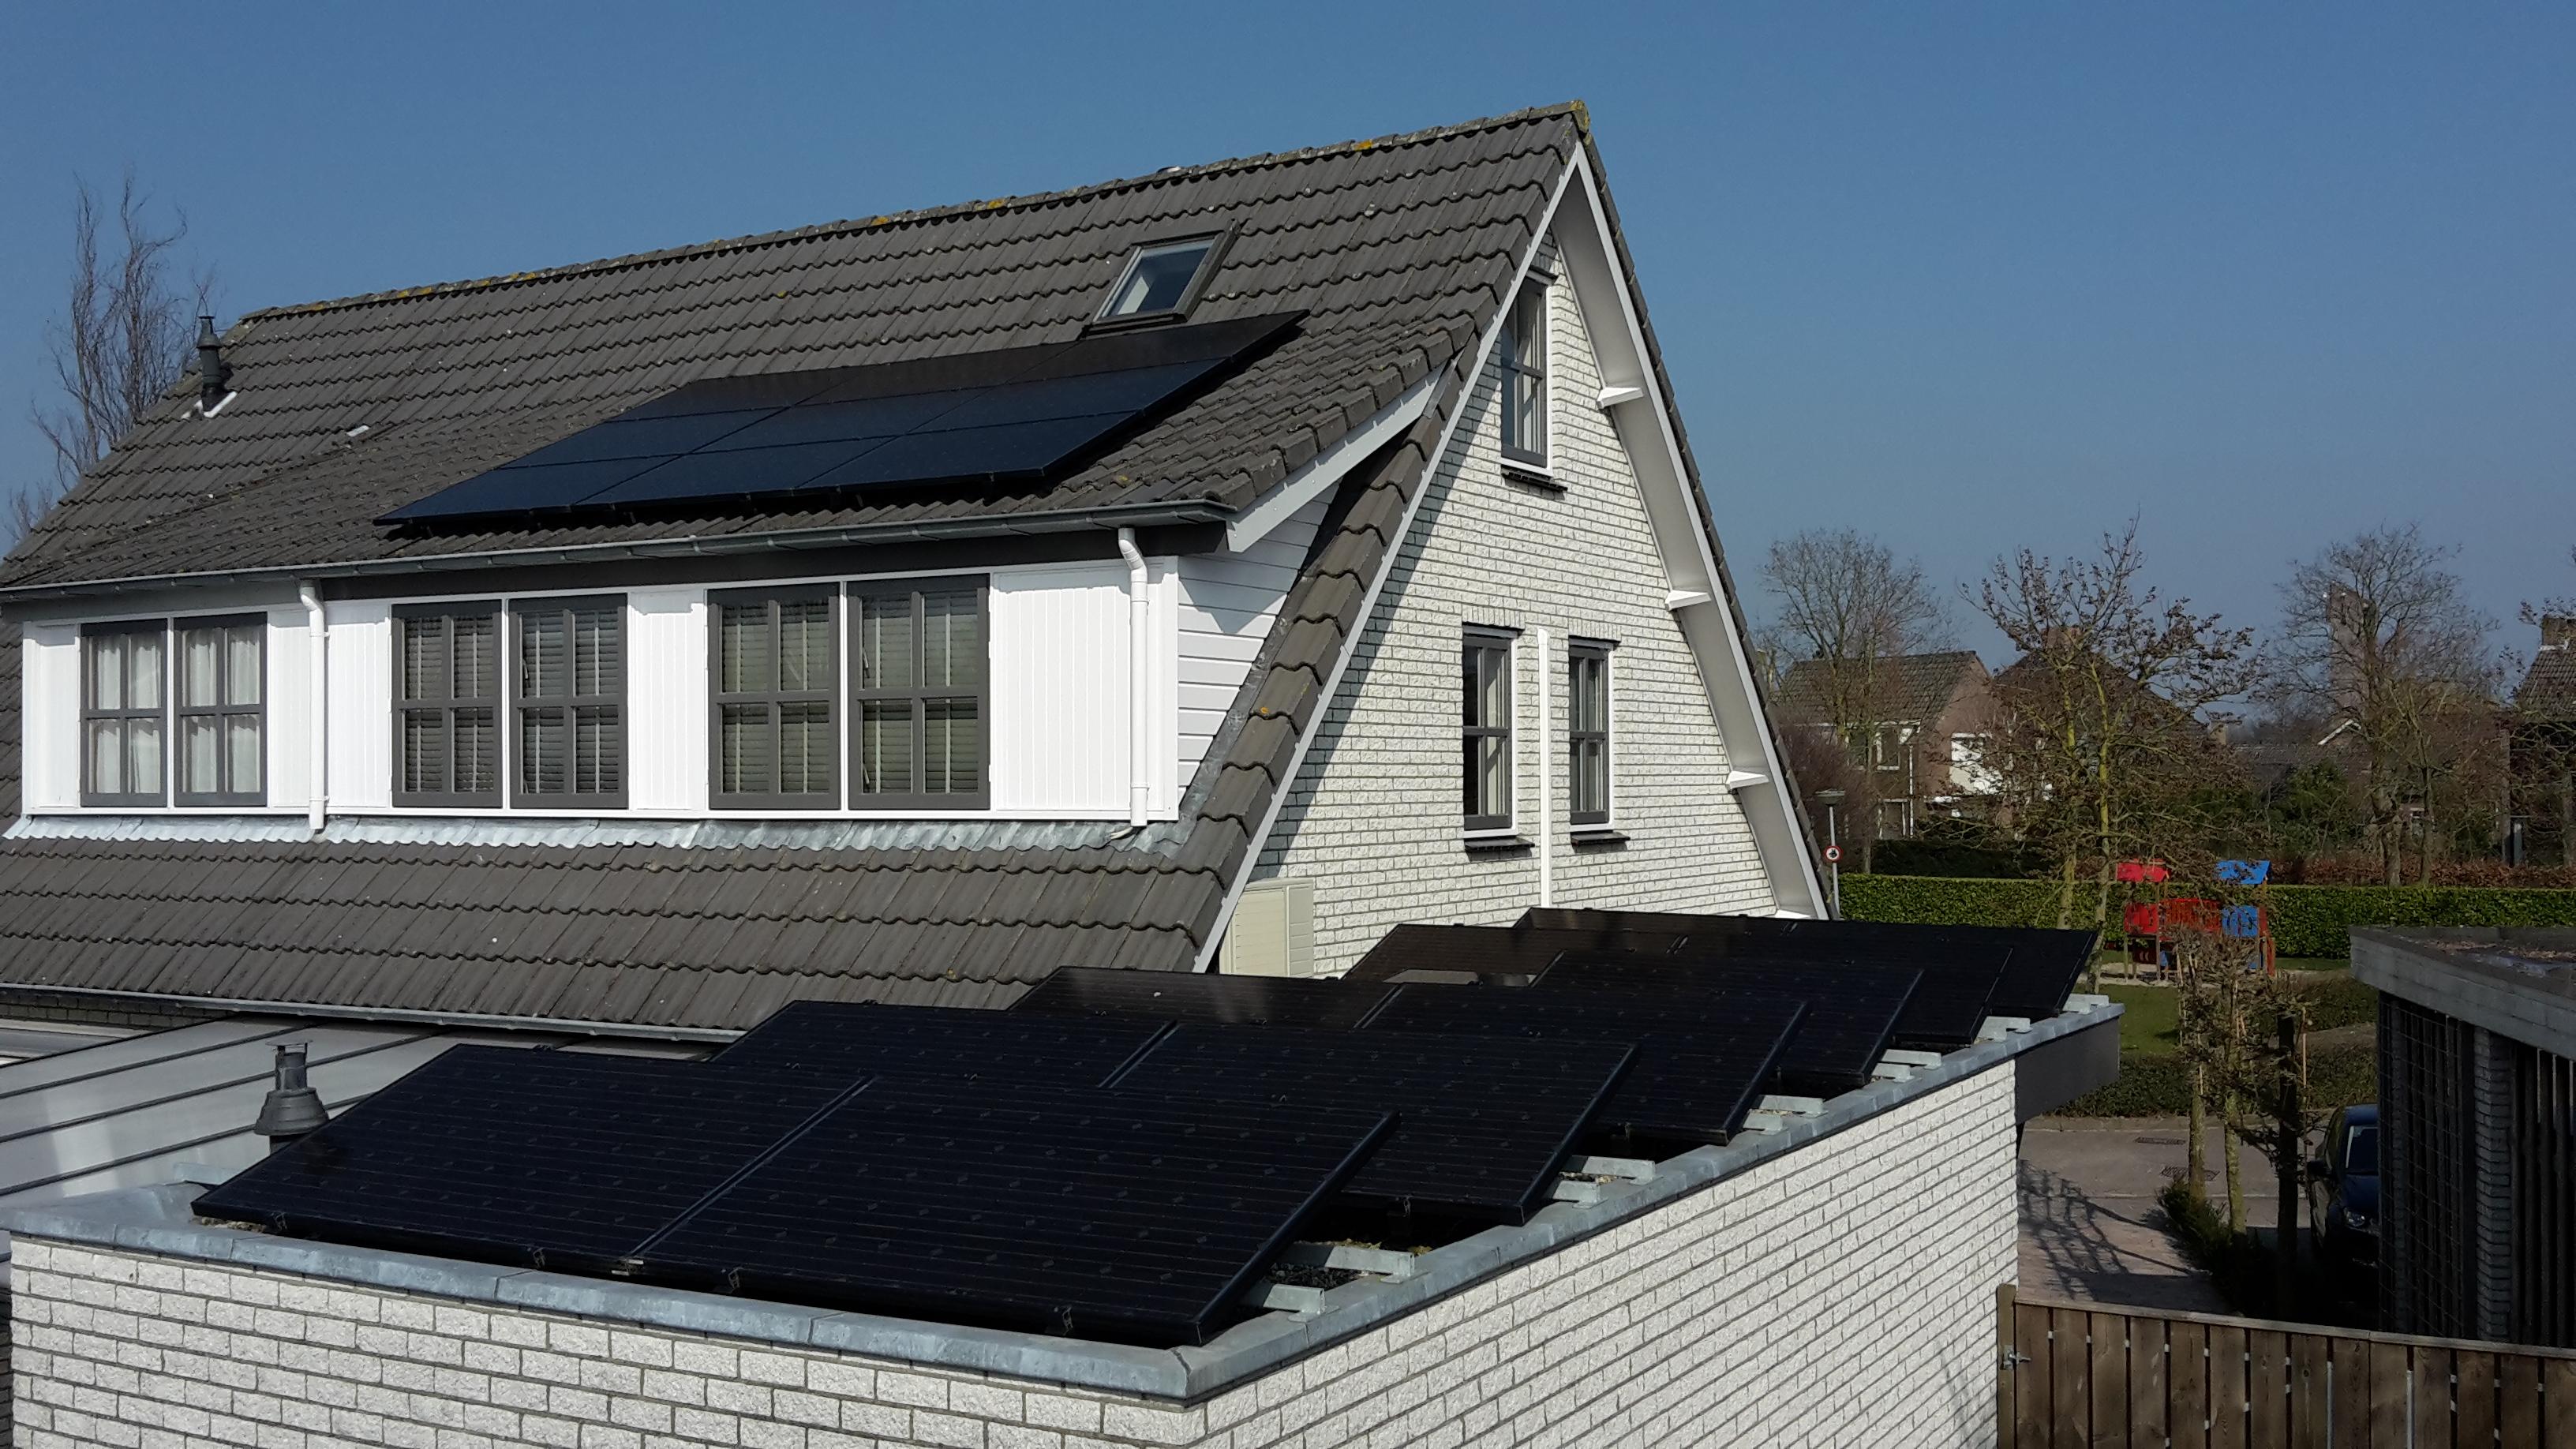 12 panelen plat dak - 9 panelen dakkapel